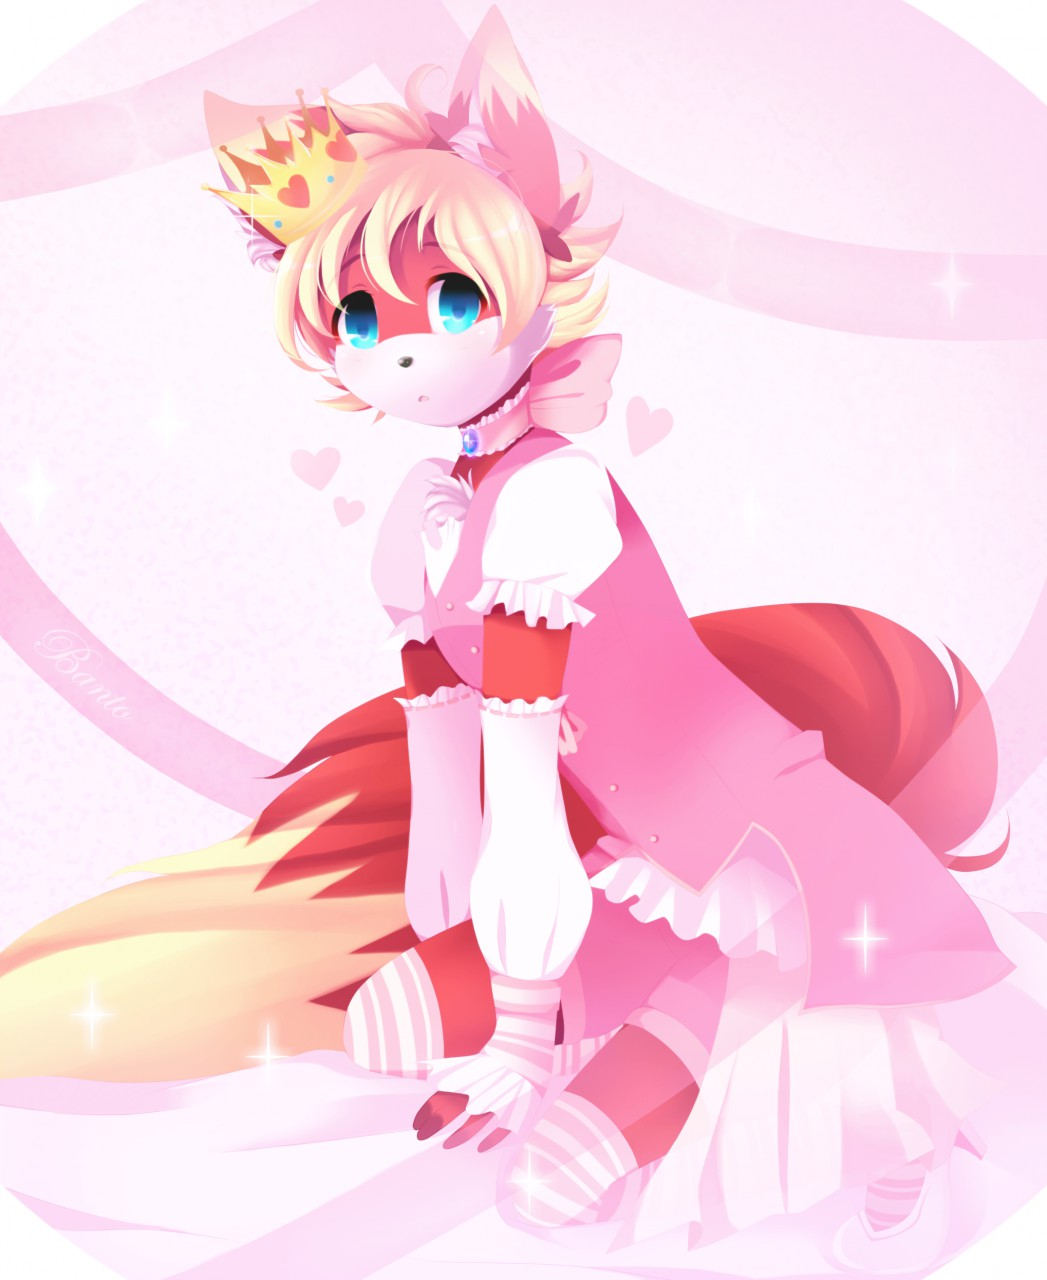 1432095619.strawberry-fox_bantobg1_by_miss_gardenia-d8tzan4.png